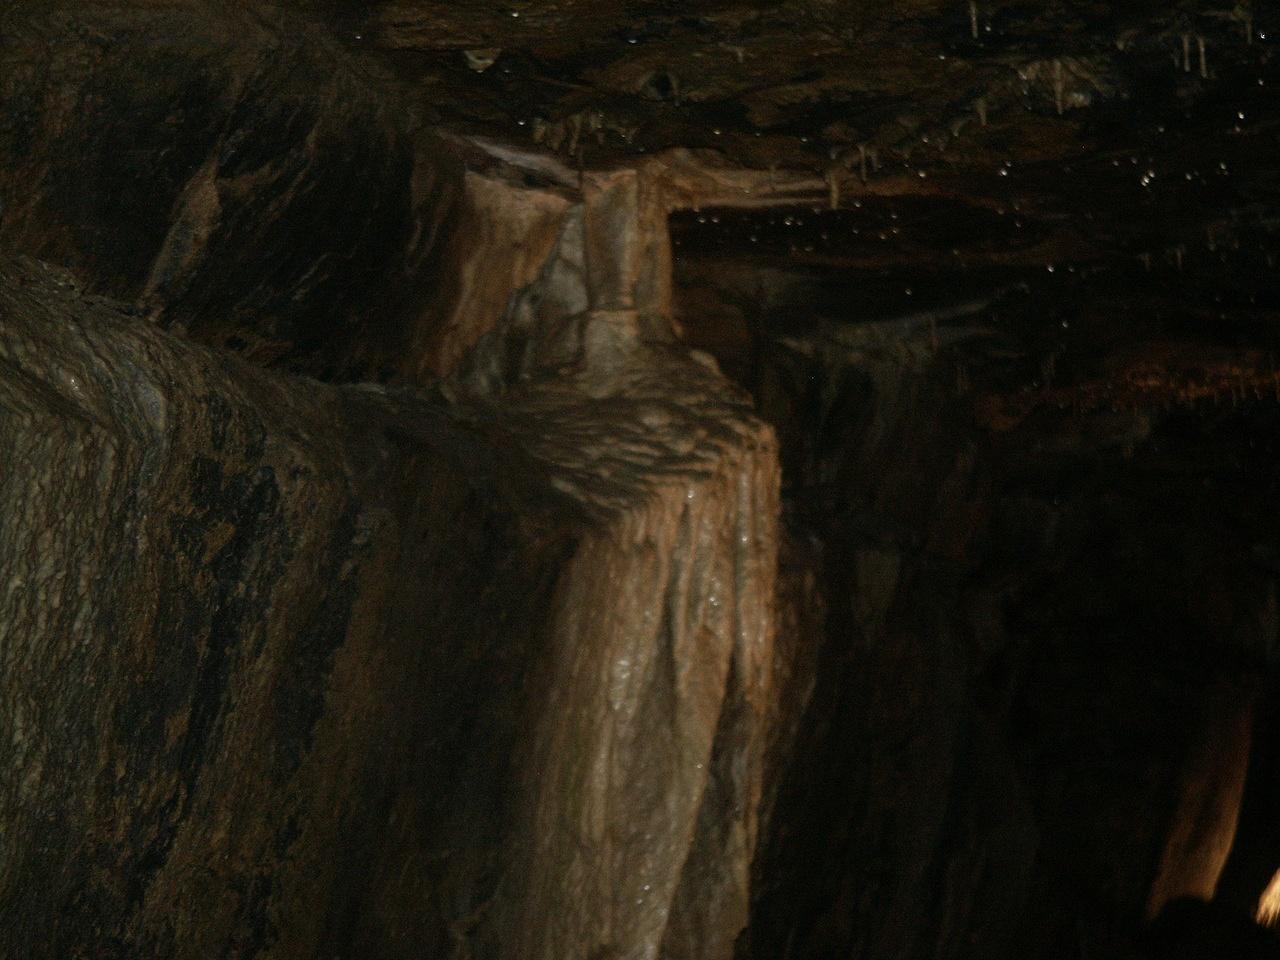 praying hands stalactite stalagmite aillwee cave